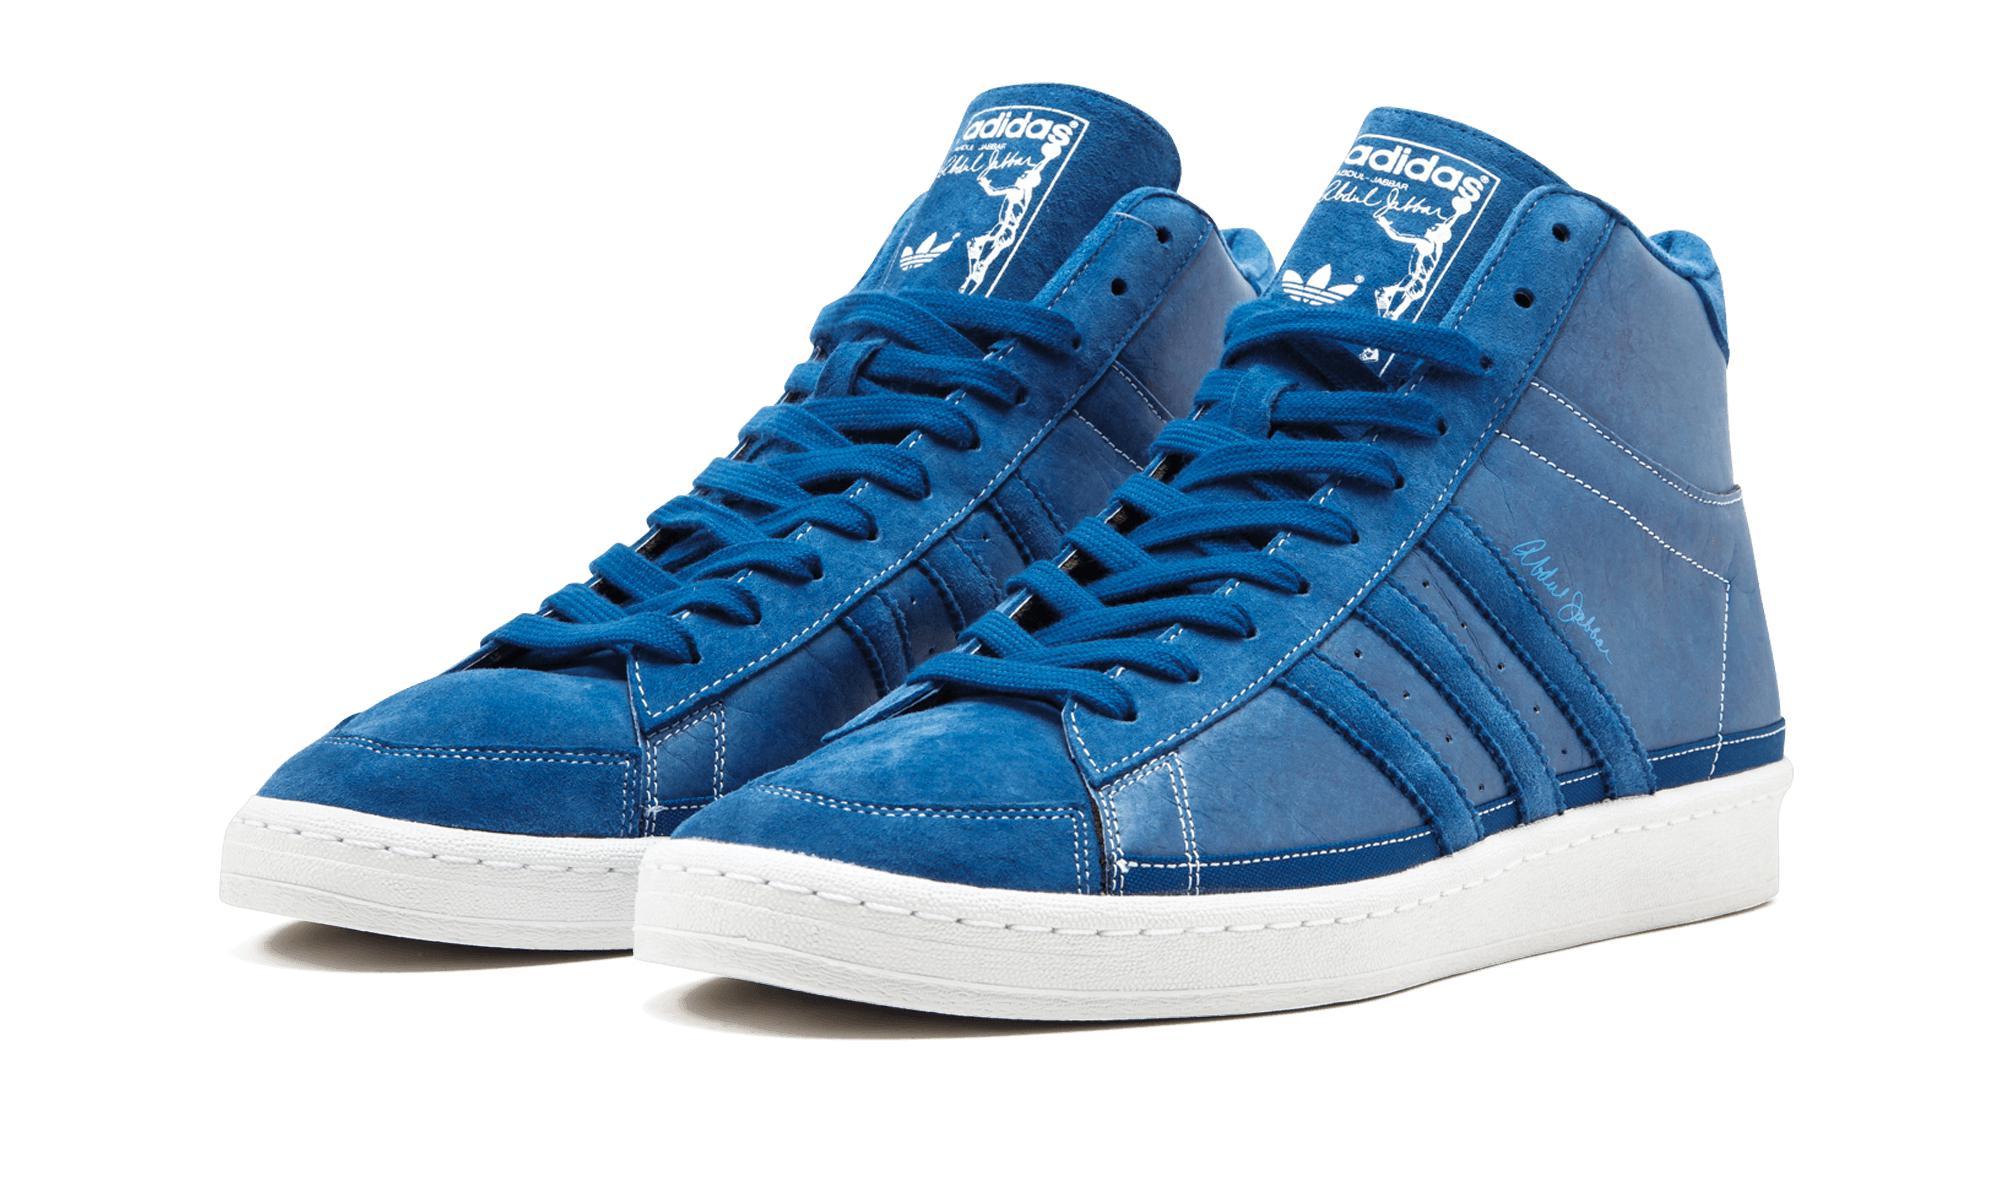 adidas jabbar blu